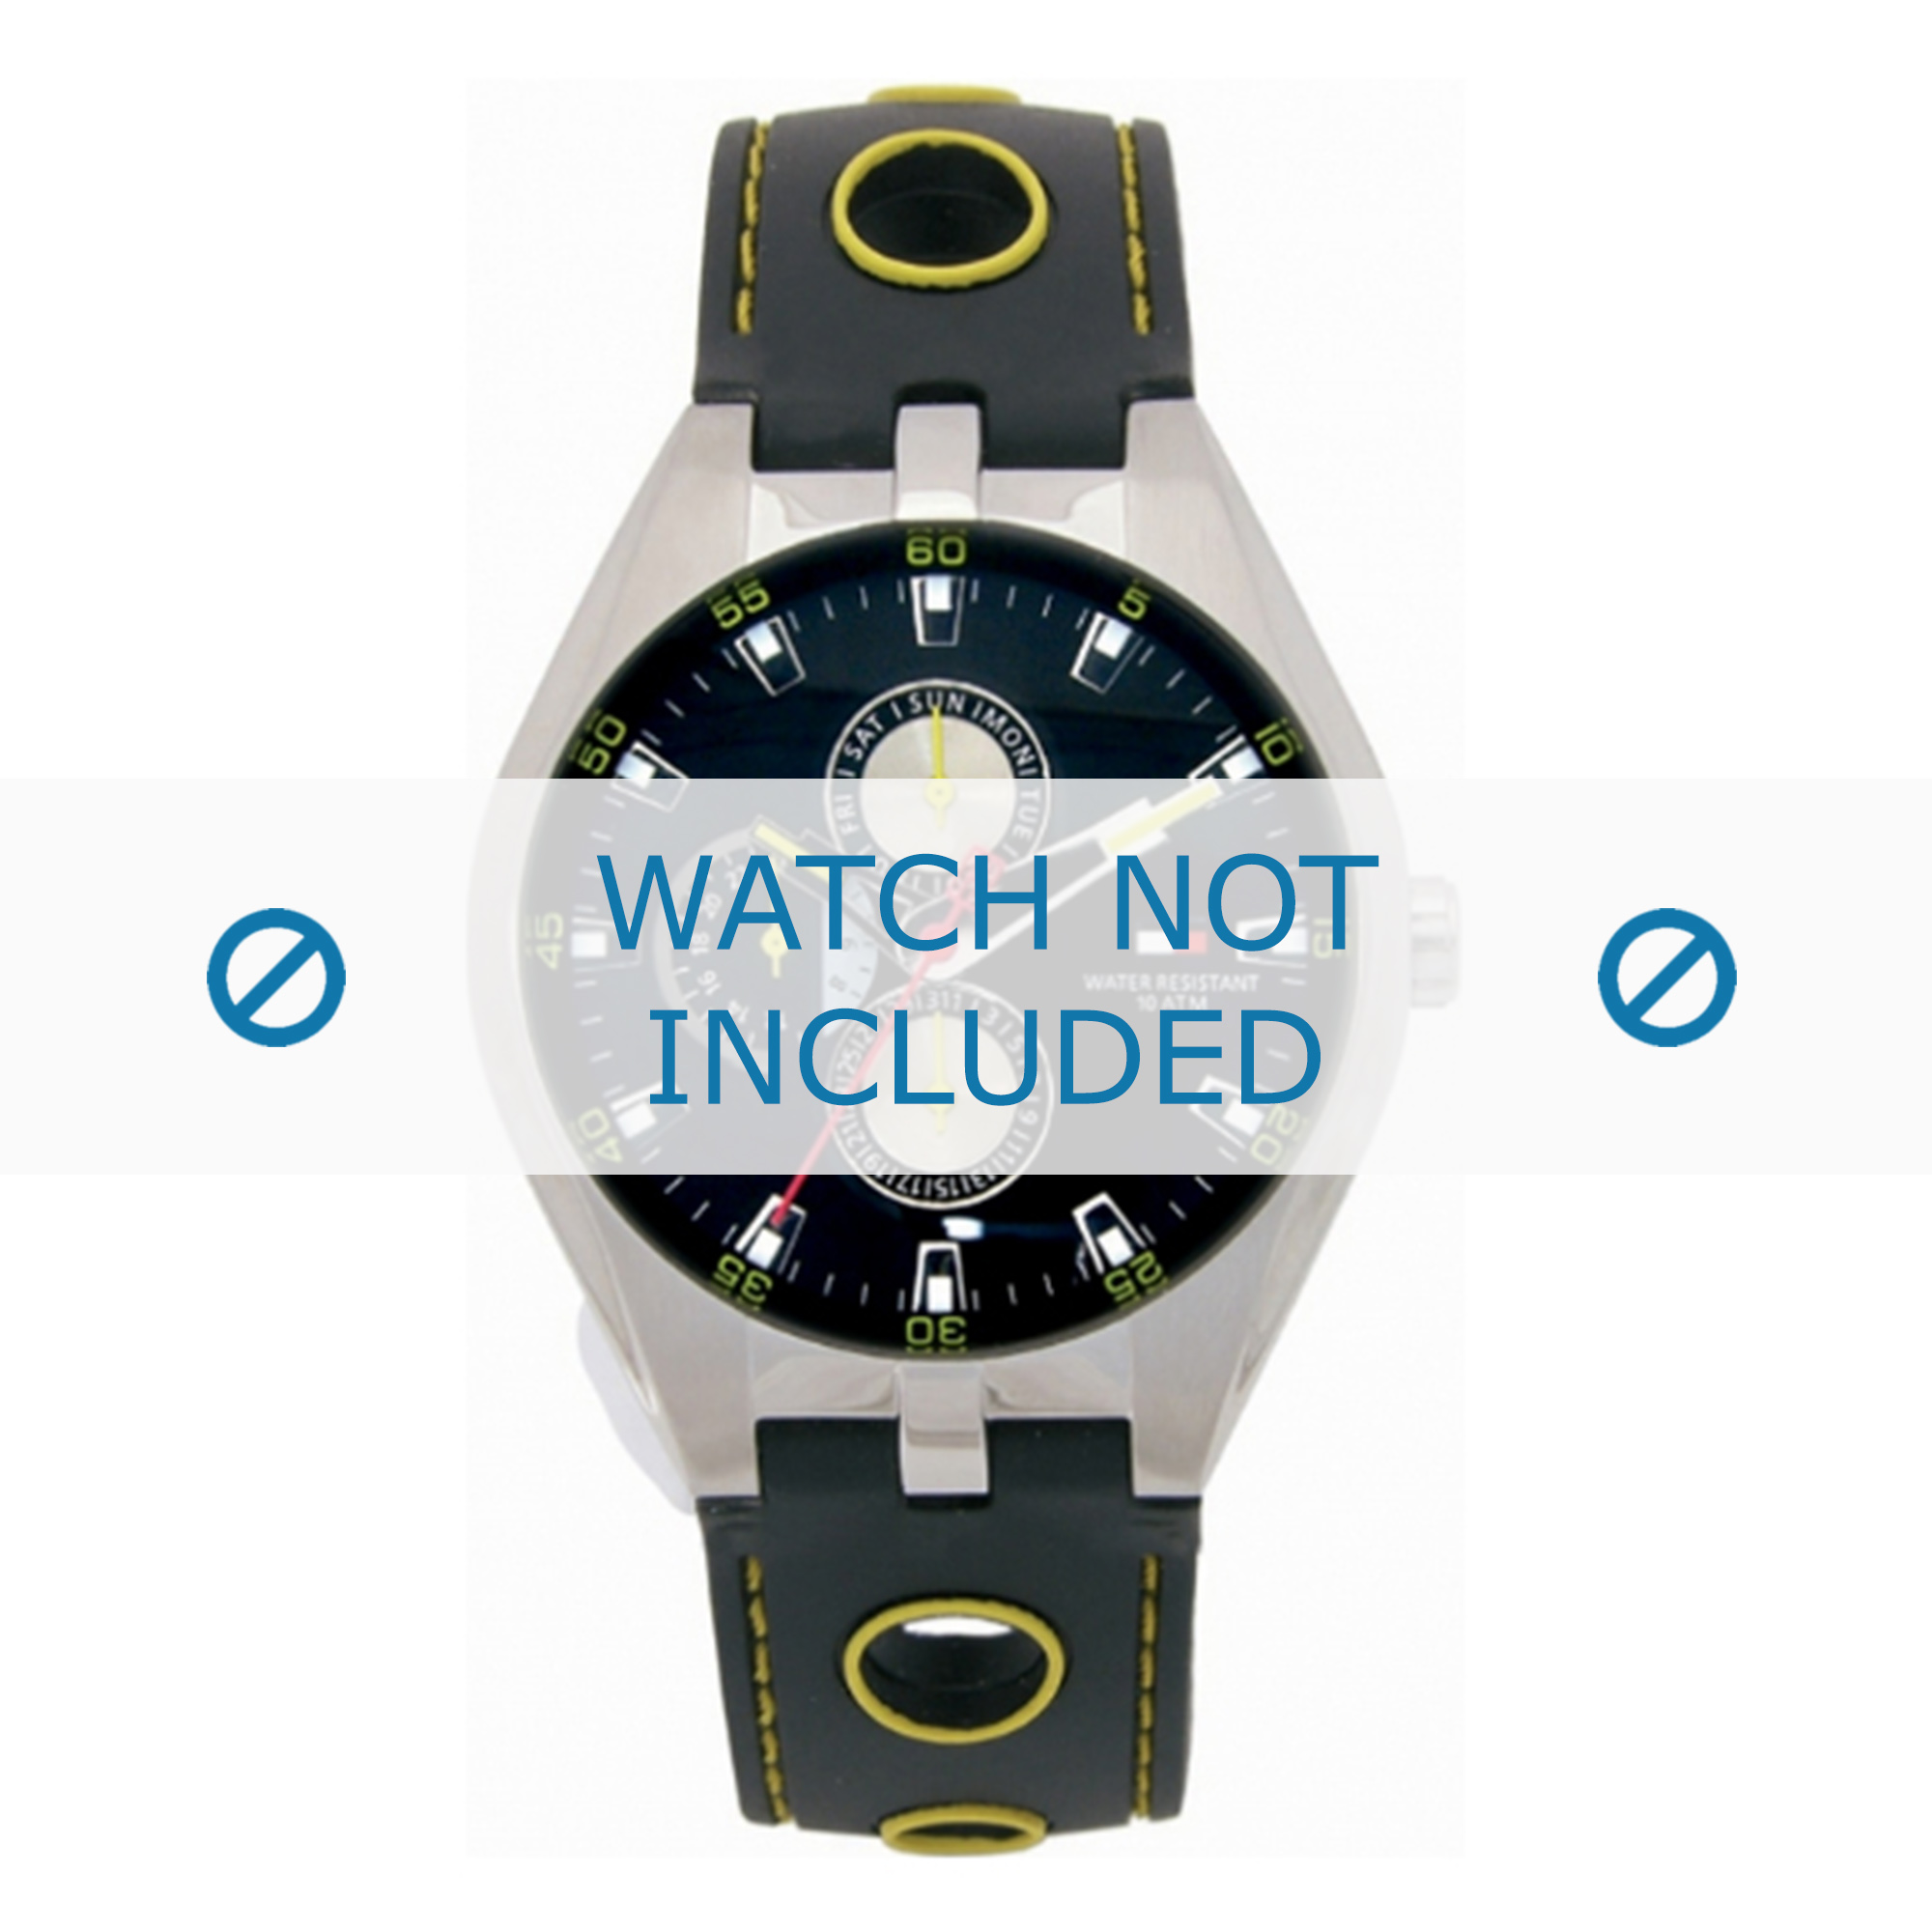 Tommy Hilfiger horlogeband TH-37-3-14-0684 - TH679300910 / 1790620 Rubber Zwart 16mm + geel stiksel